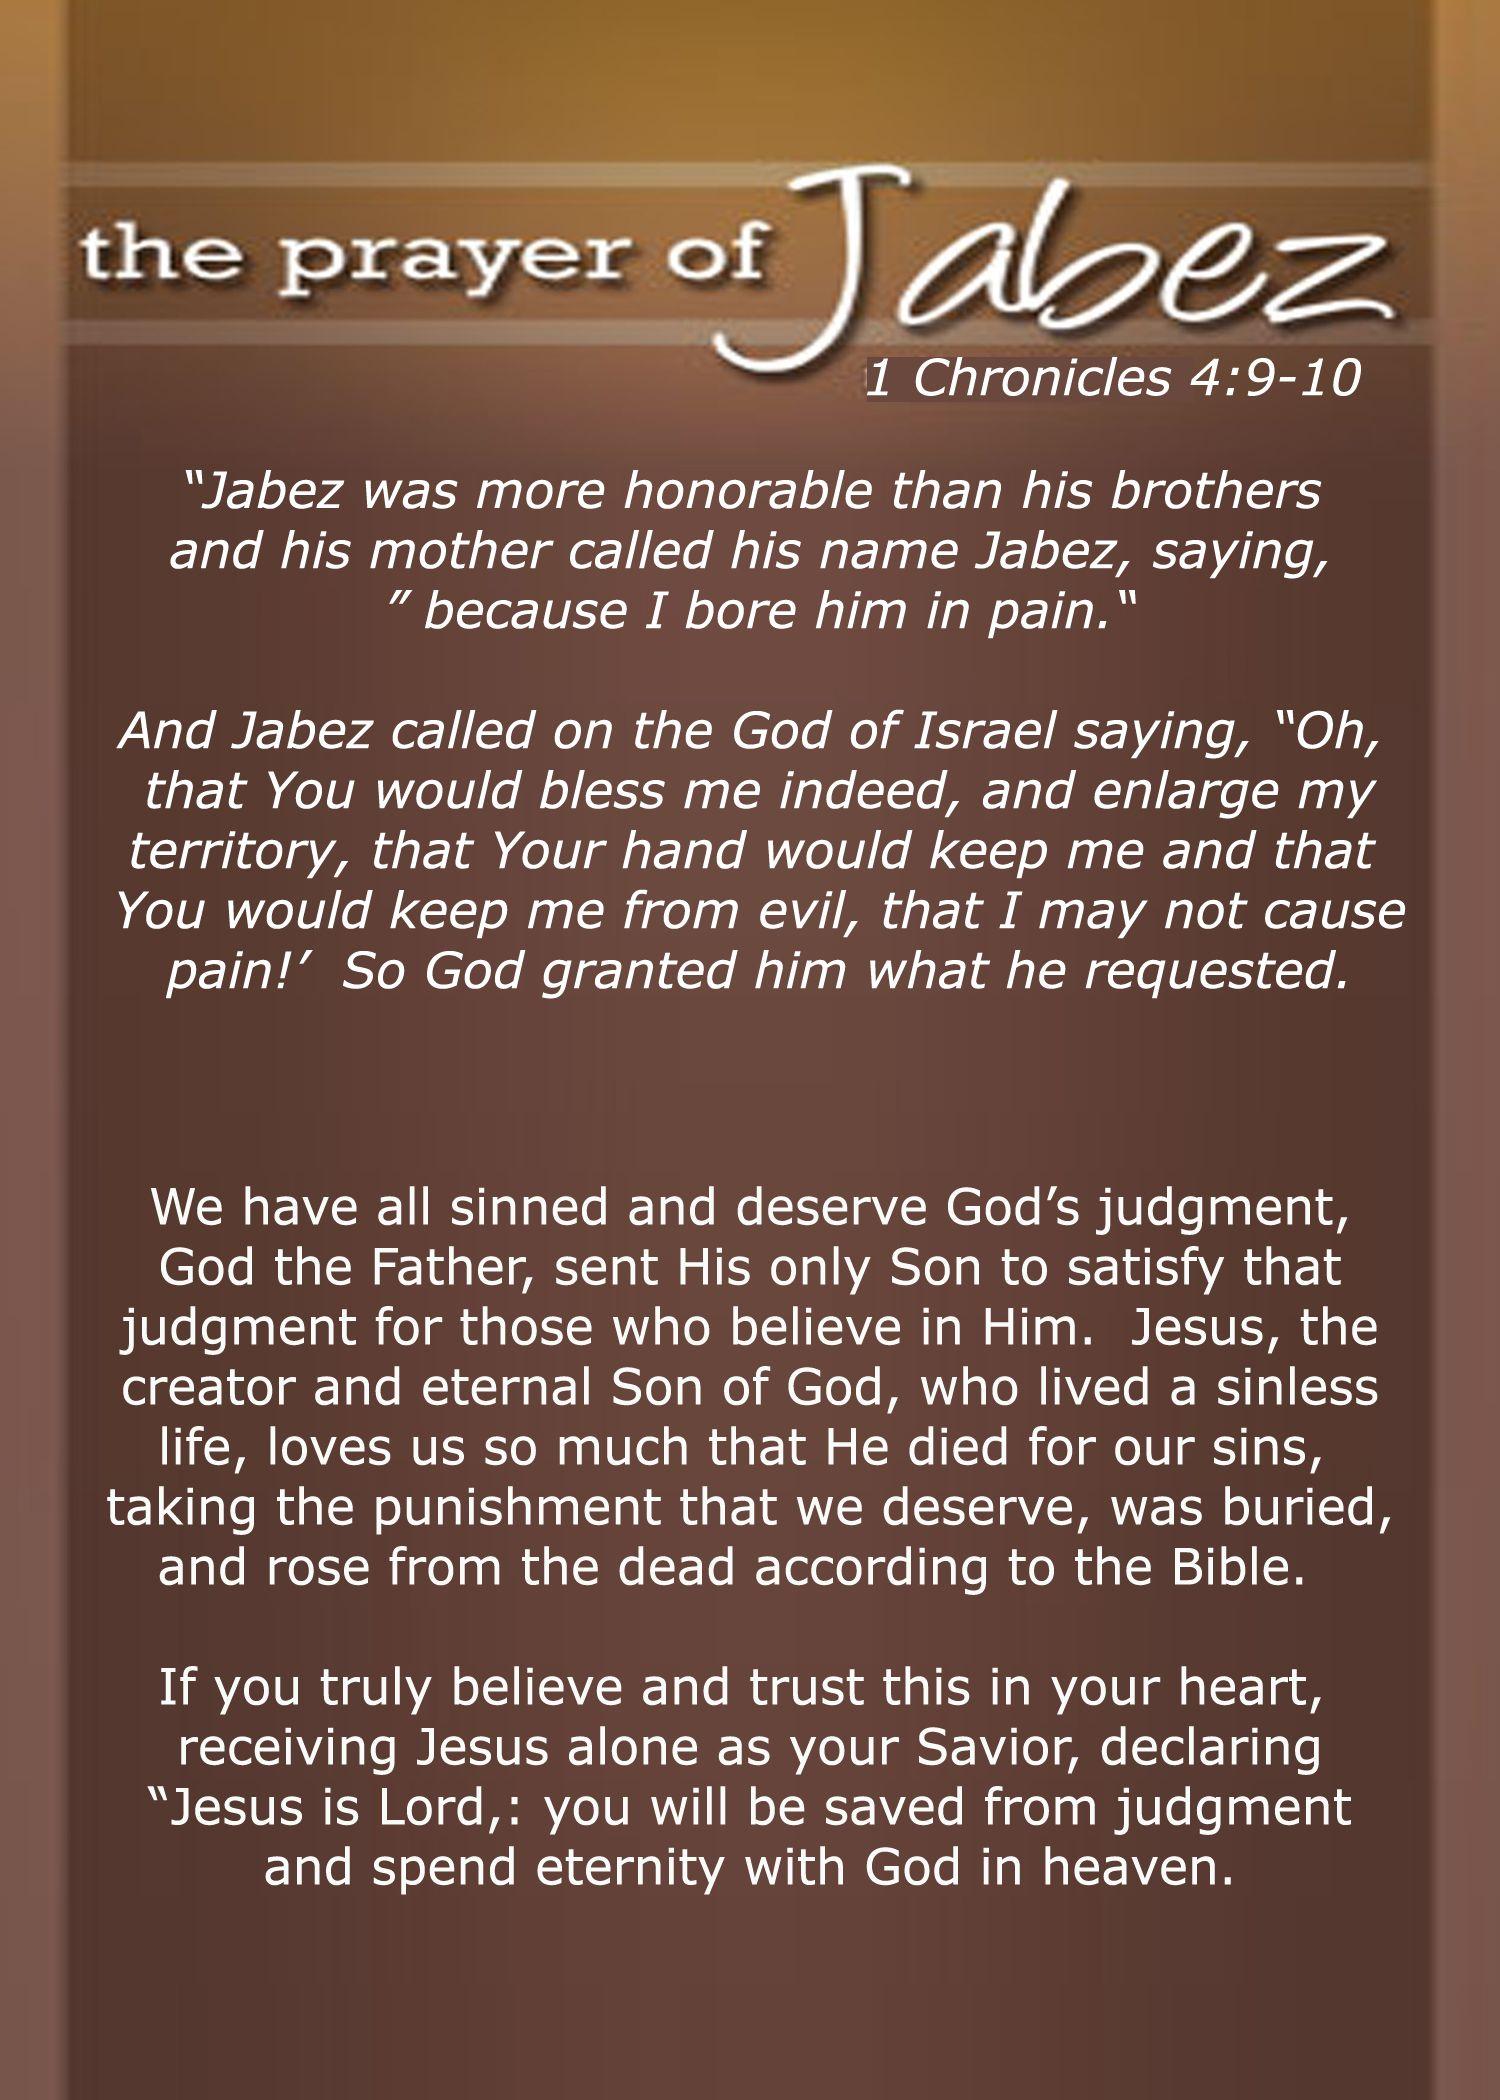 The Prayer of Jabez, 1 Chronicles 4:9-10 | Scriptures | Prayer